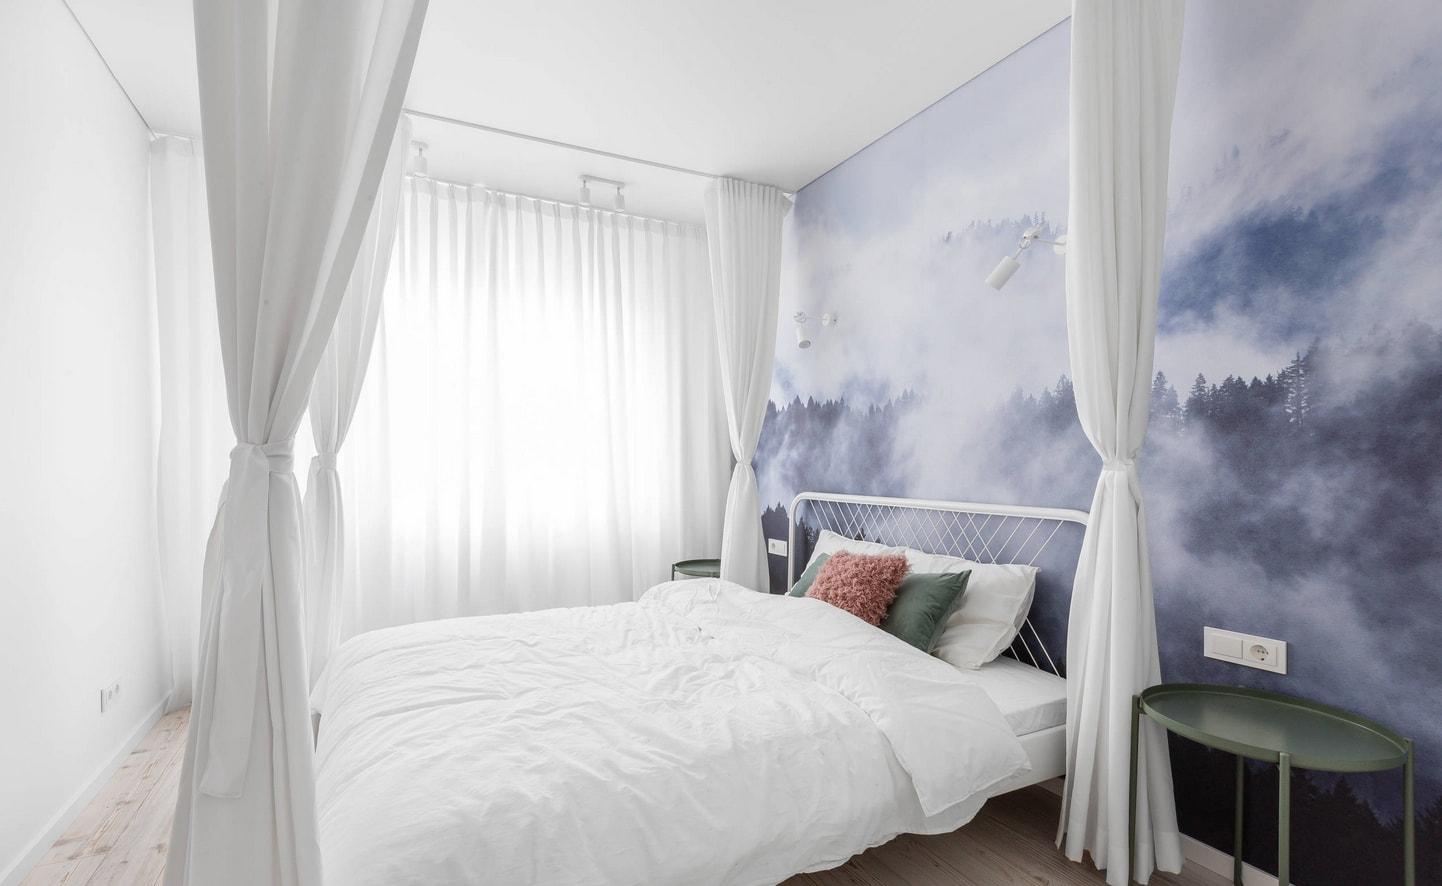 потолочный балдахин в комнате фото